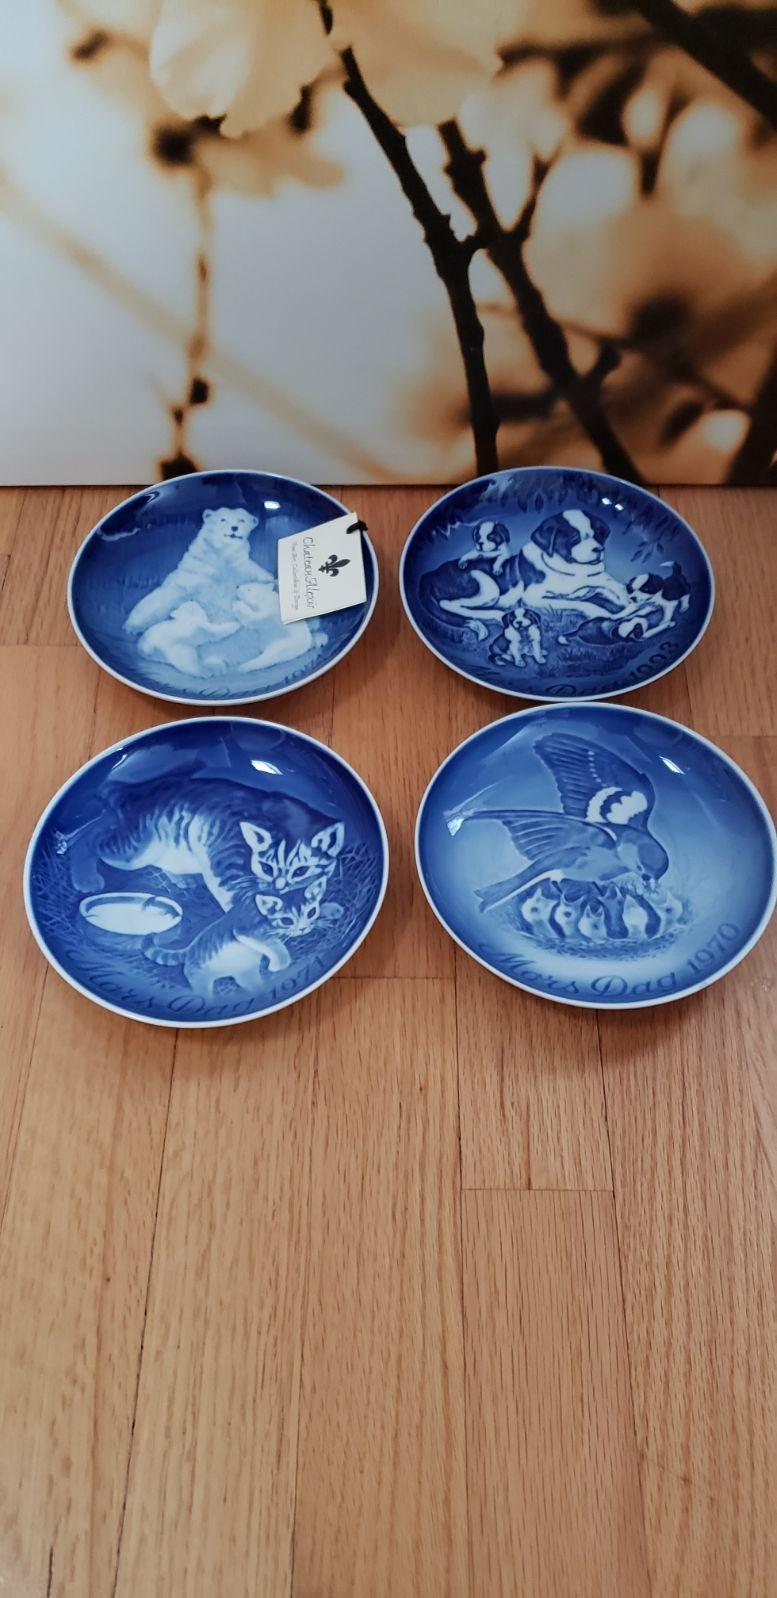 Mother's Day Plates by B&G Copenhagen.